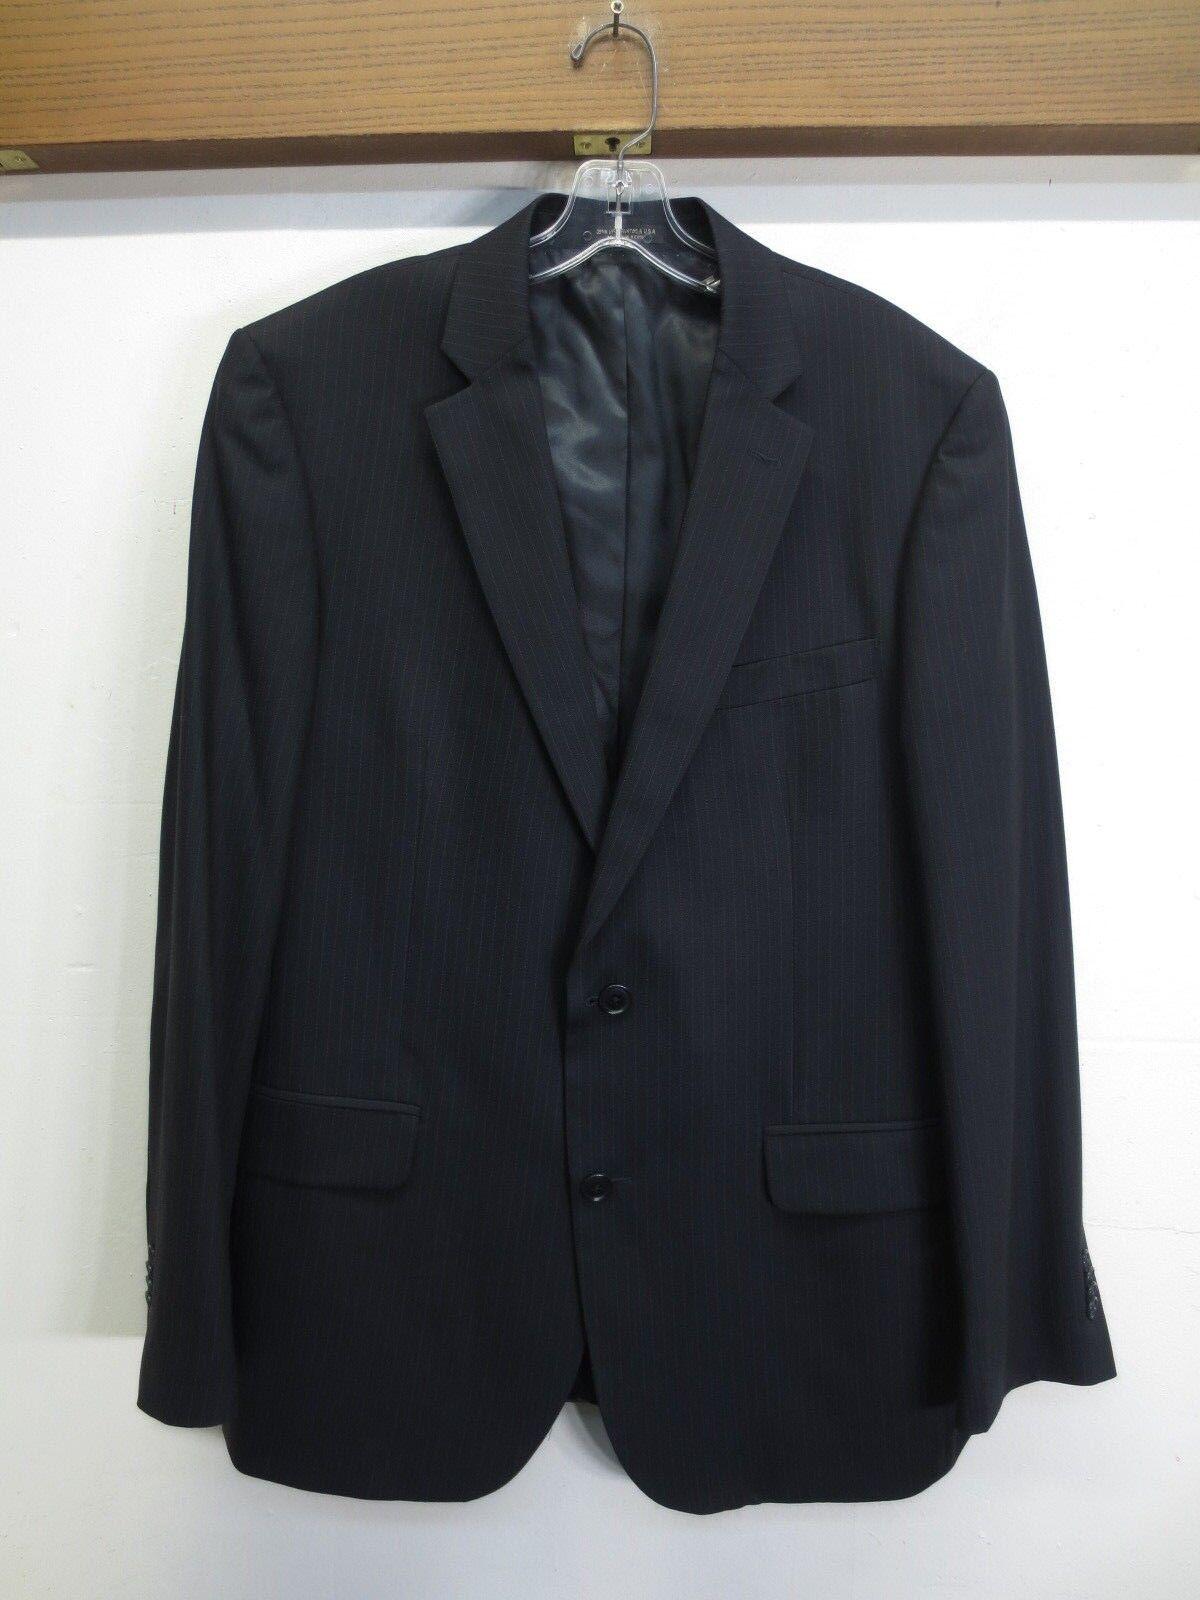 EUC John Varvatos USA Bedford Blazer Wool 2 Button 2 Vent Navy Stripe Sz 42R